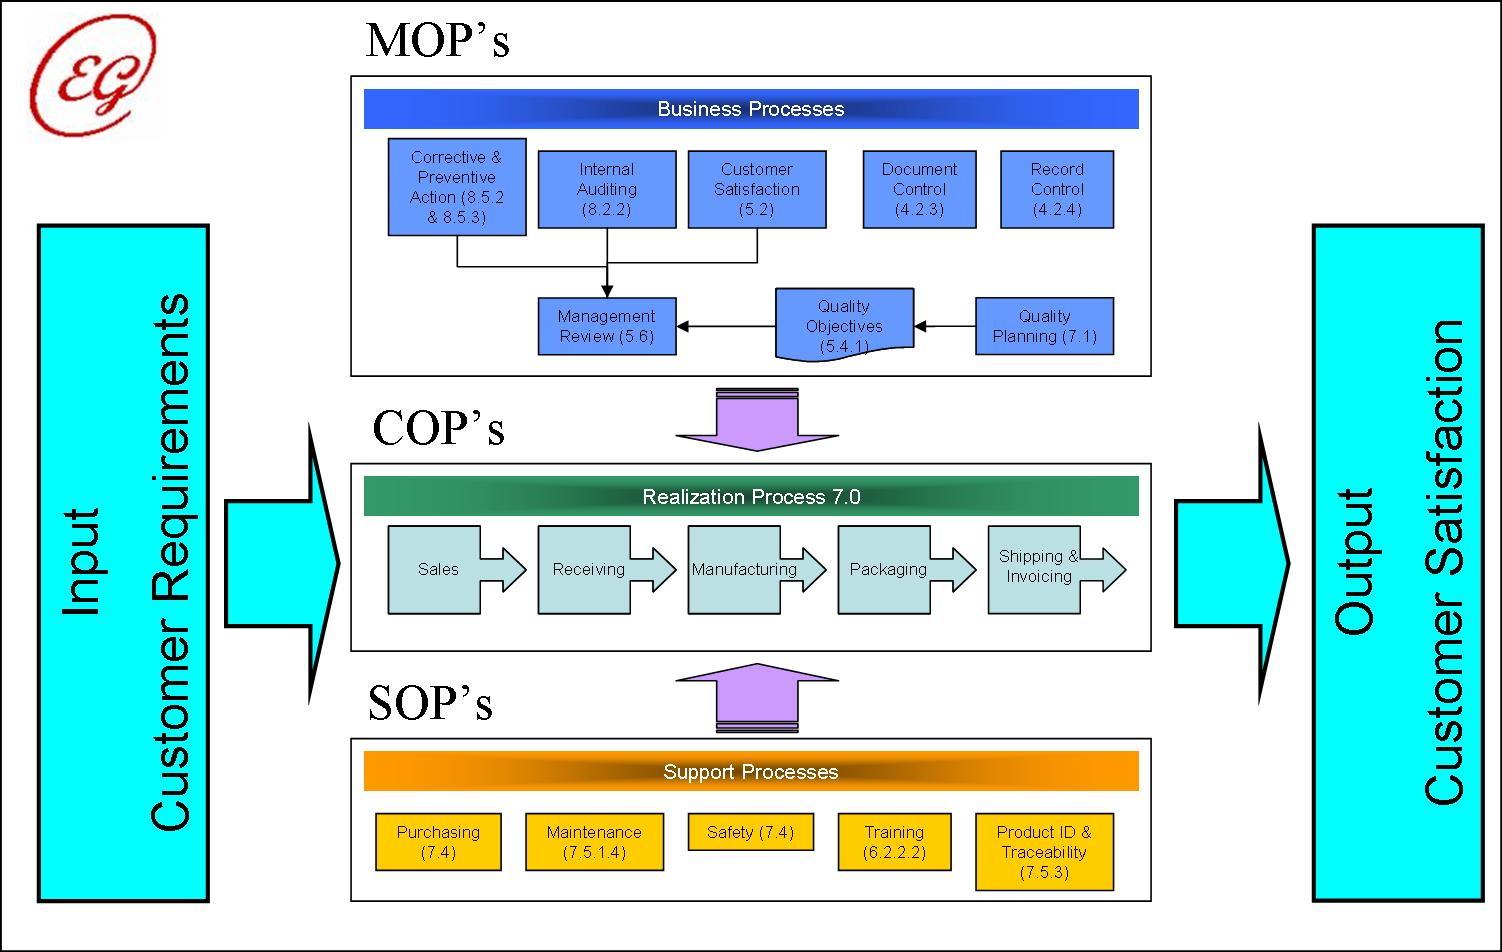 iso process audit turtle diagram 2001 nissan altima wiring nadh wiki durabrand tv